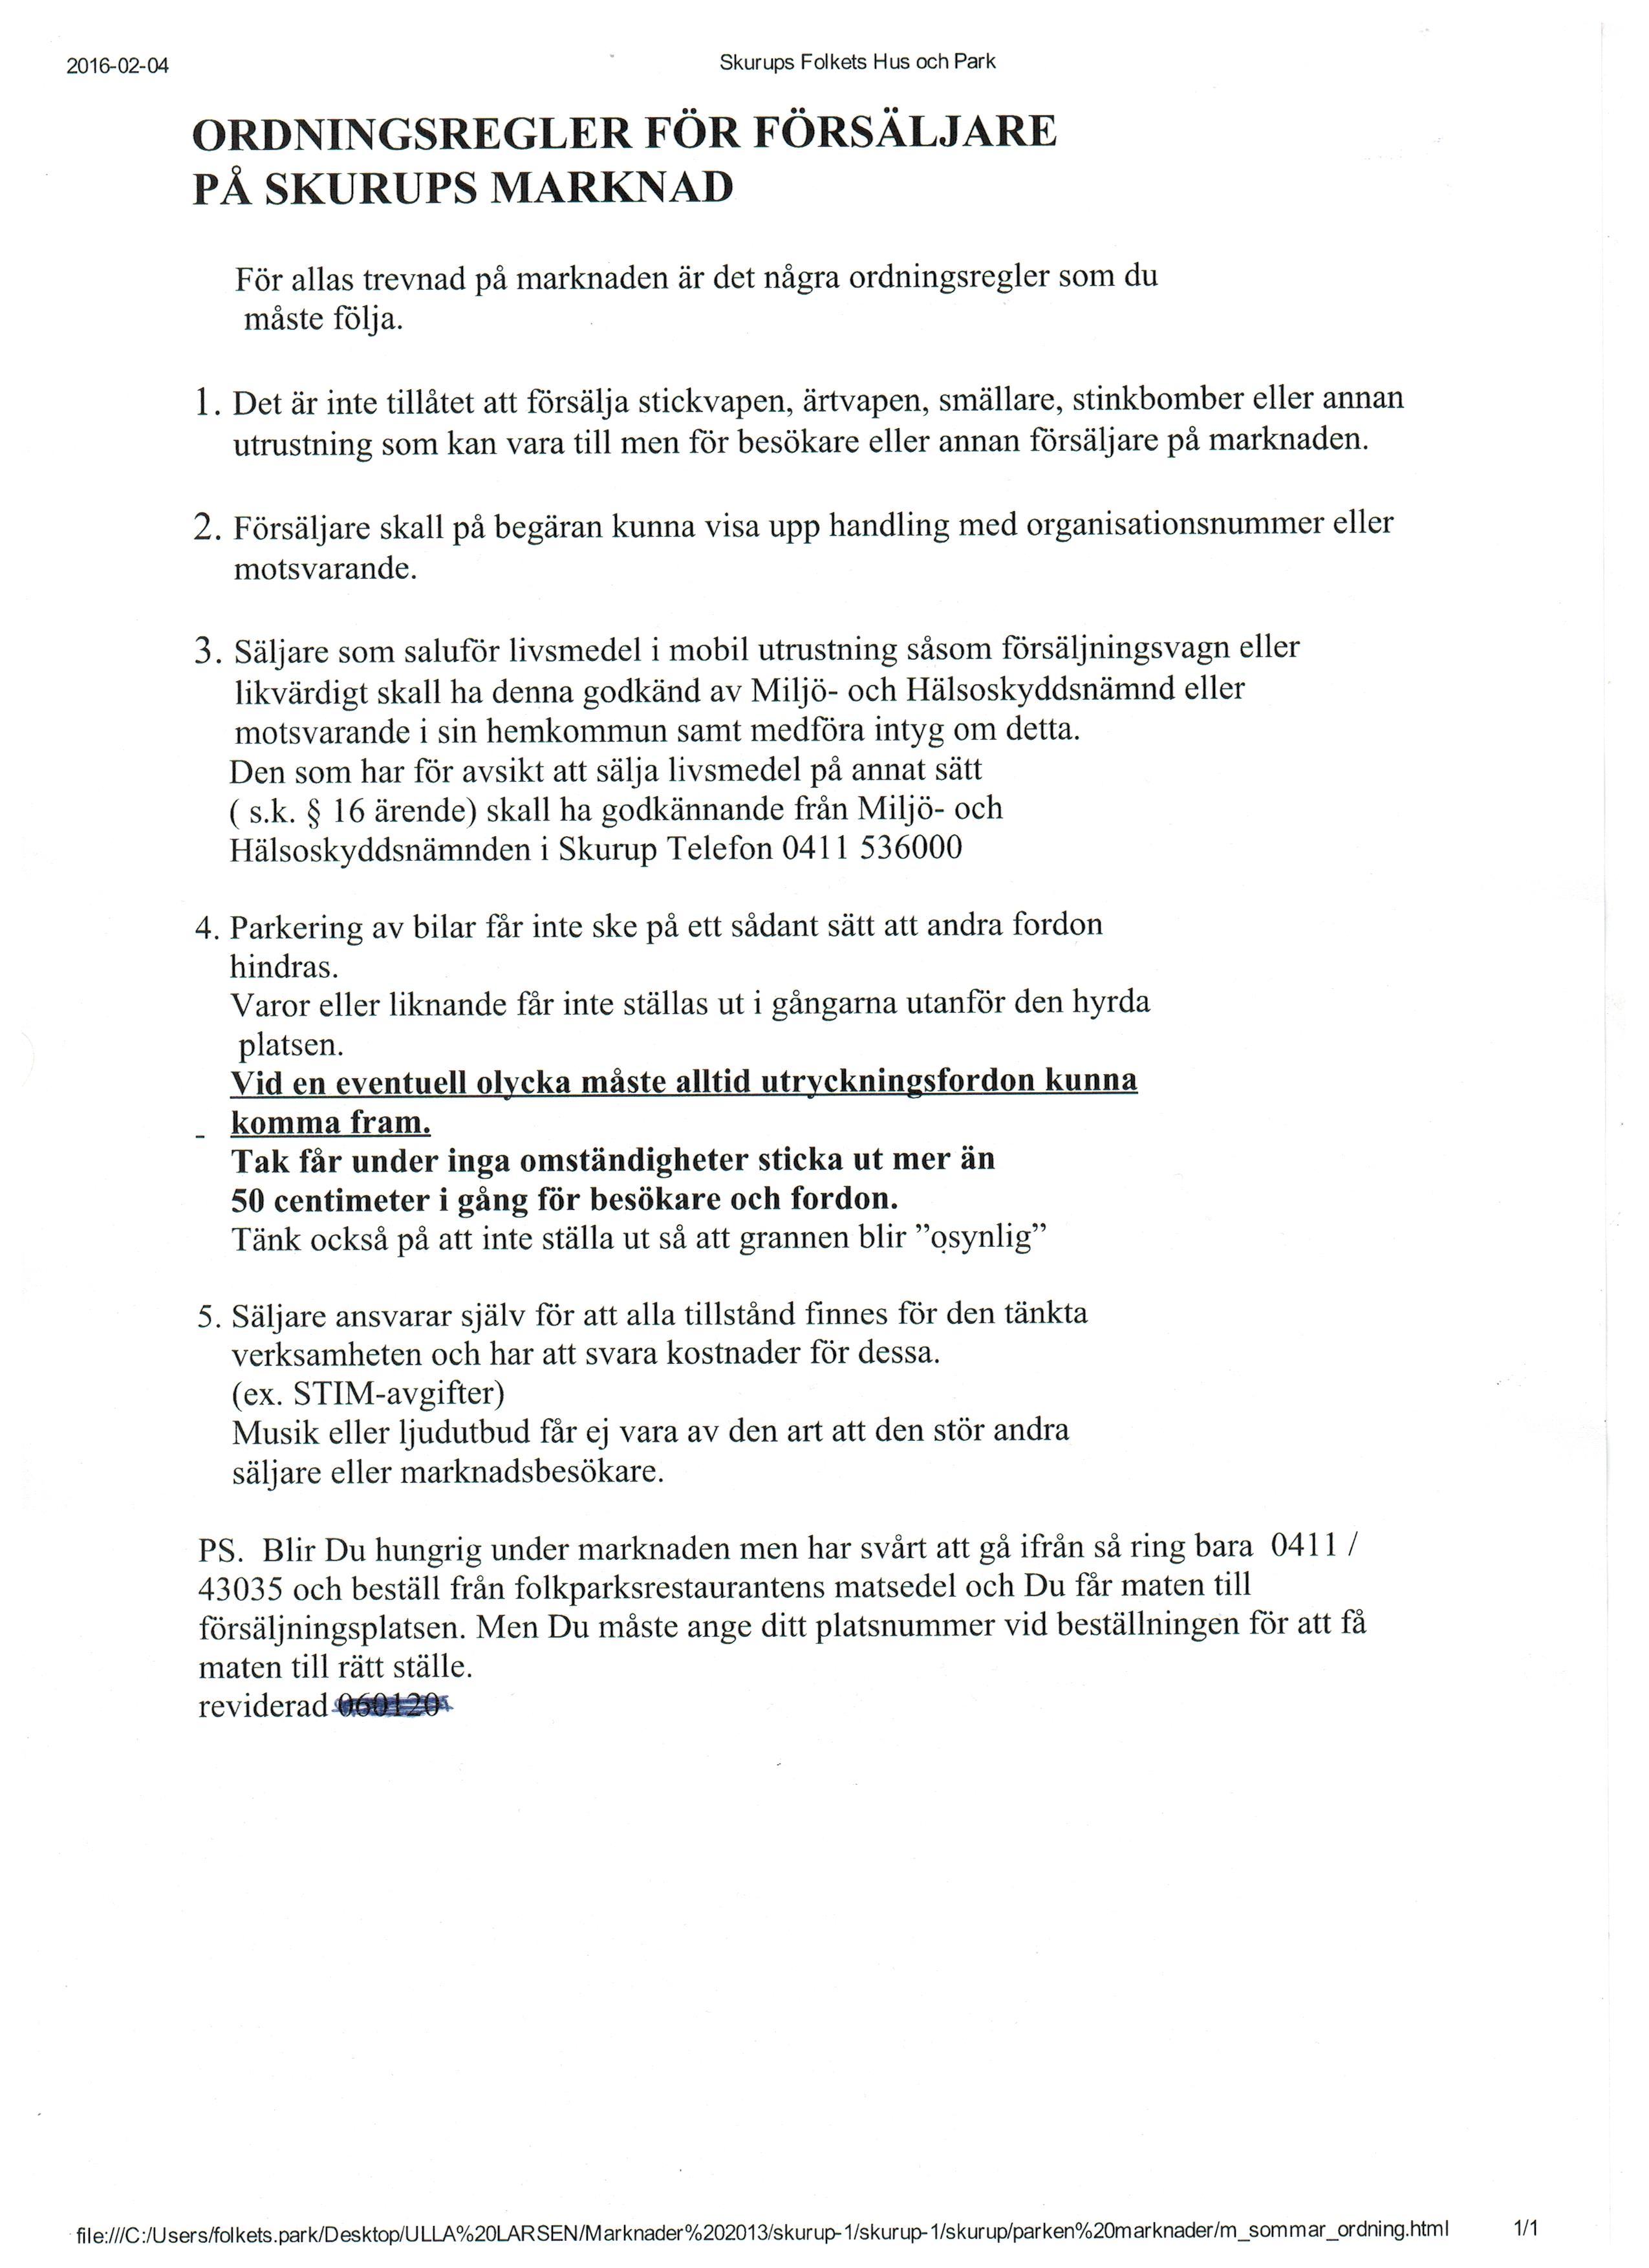 ordningsregler marknad 001